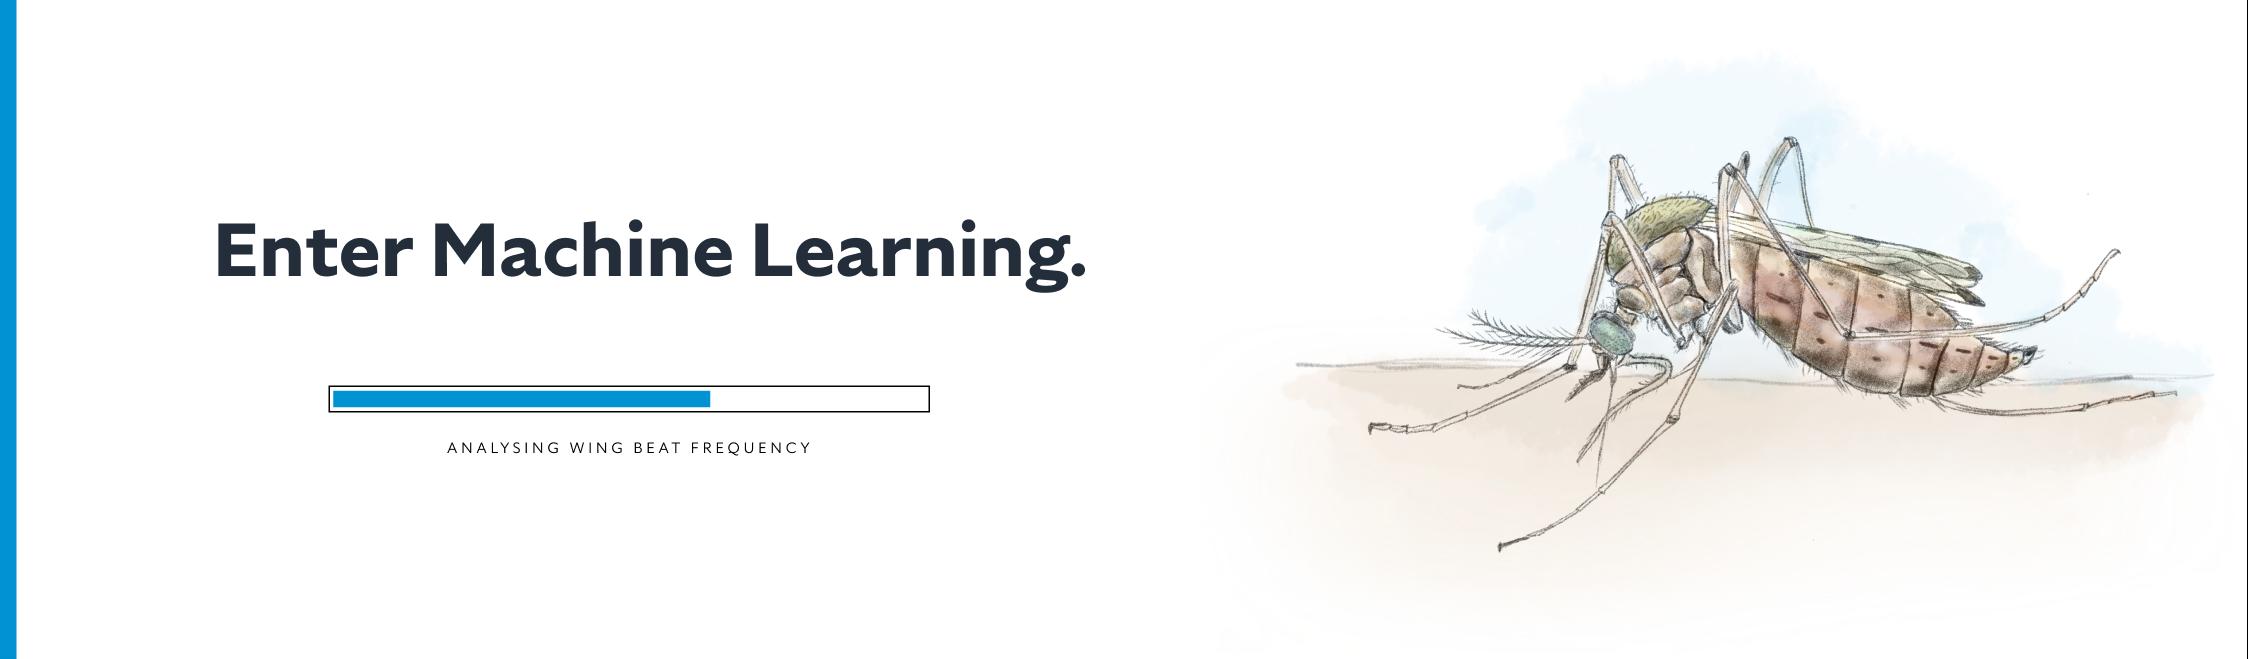 Enter Machine Learning